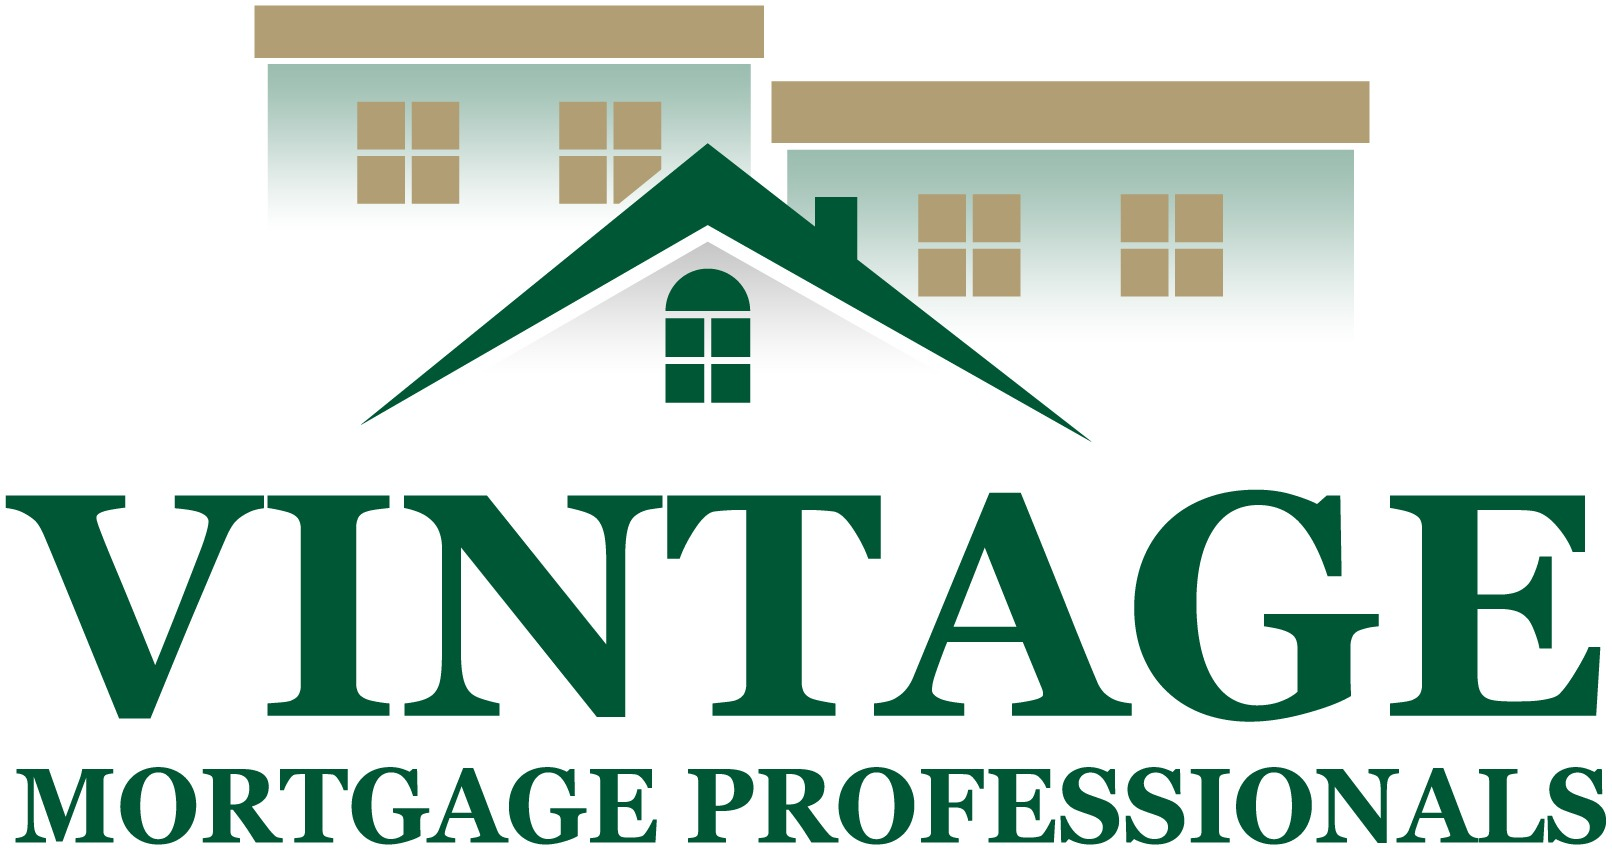 Vintage Mortgage Professionals